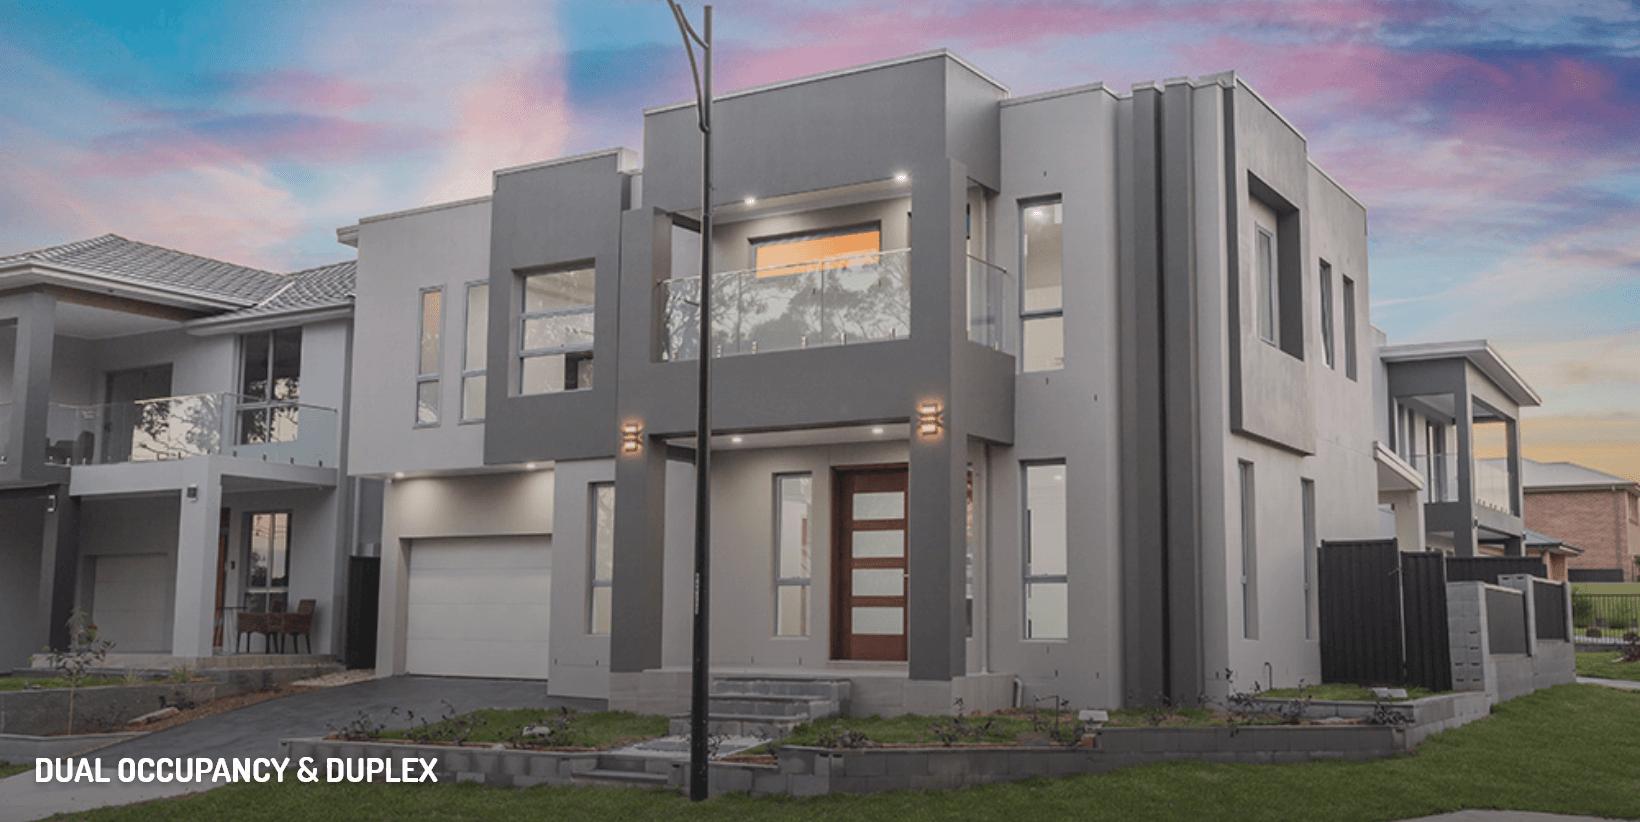 Dual Occupancy & Duplex